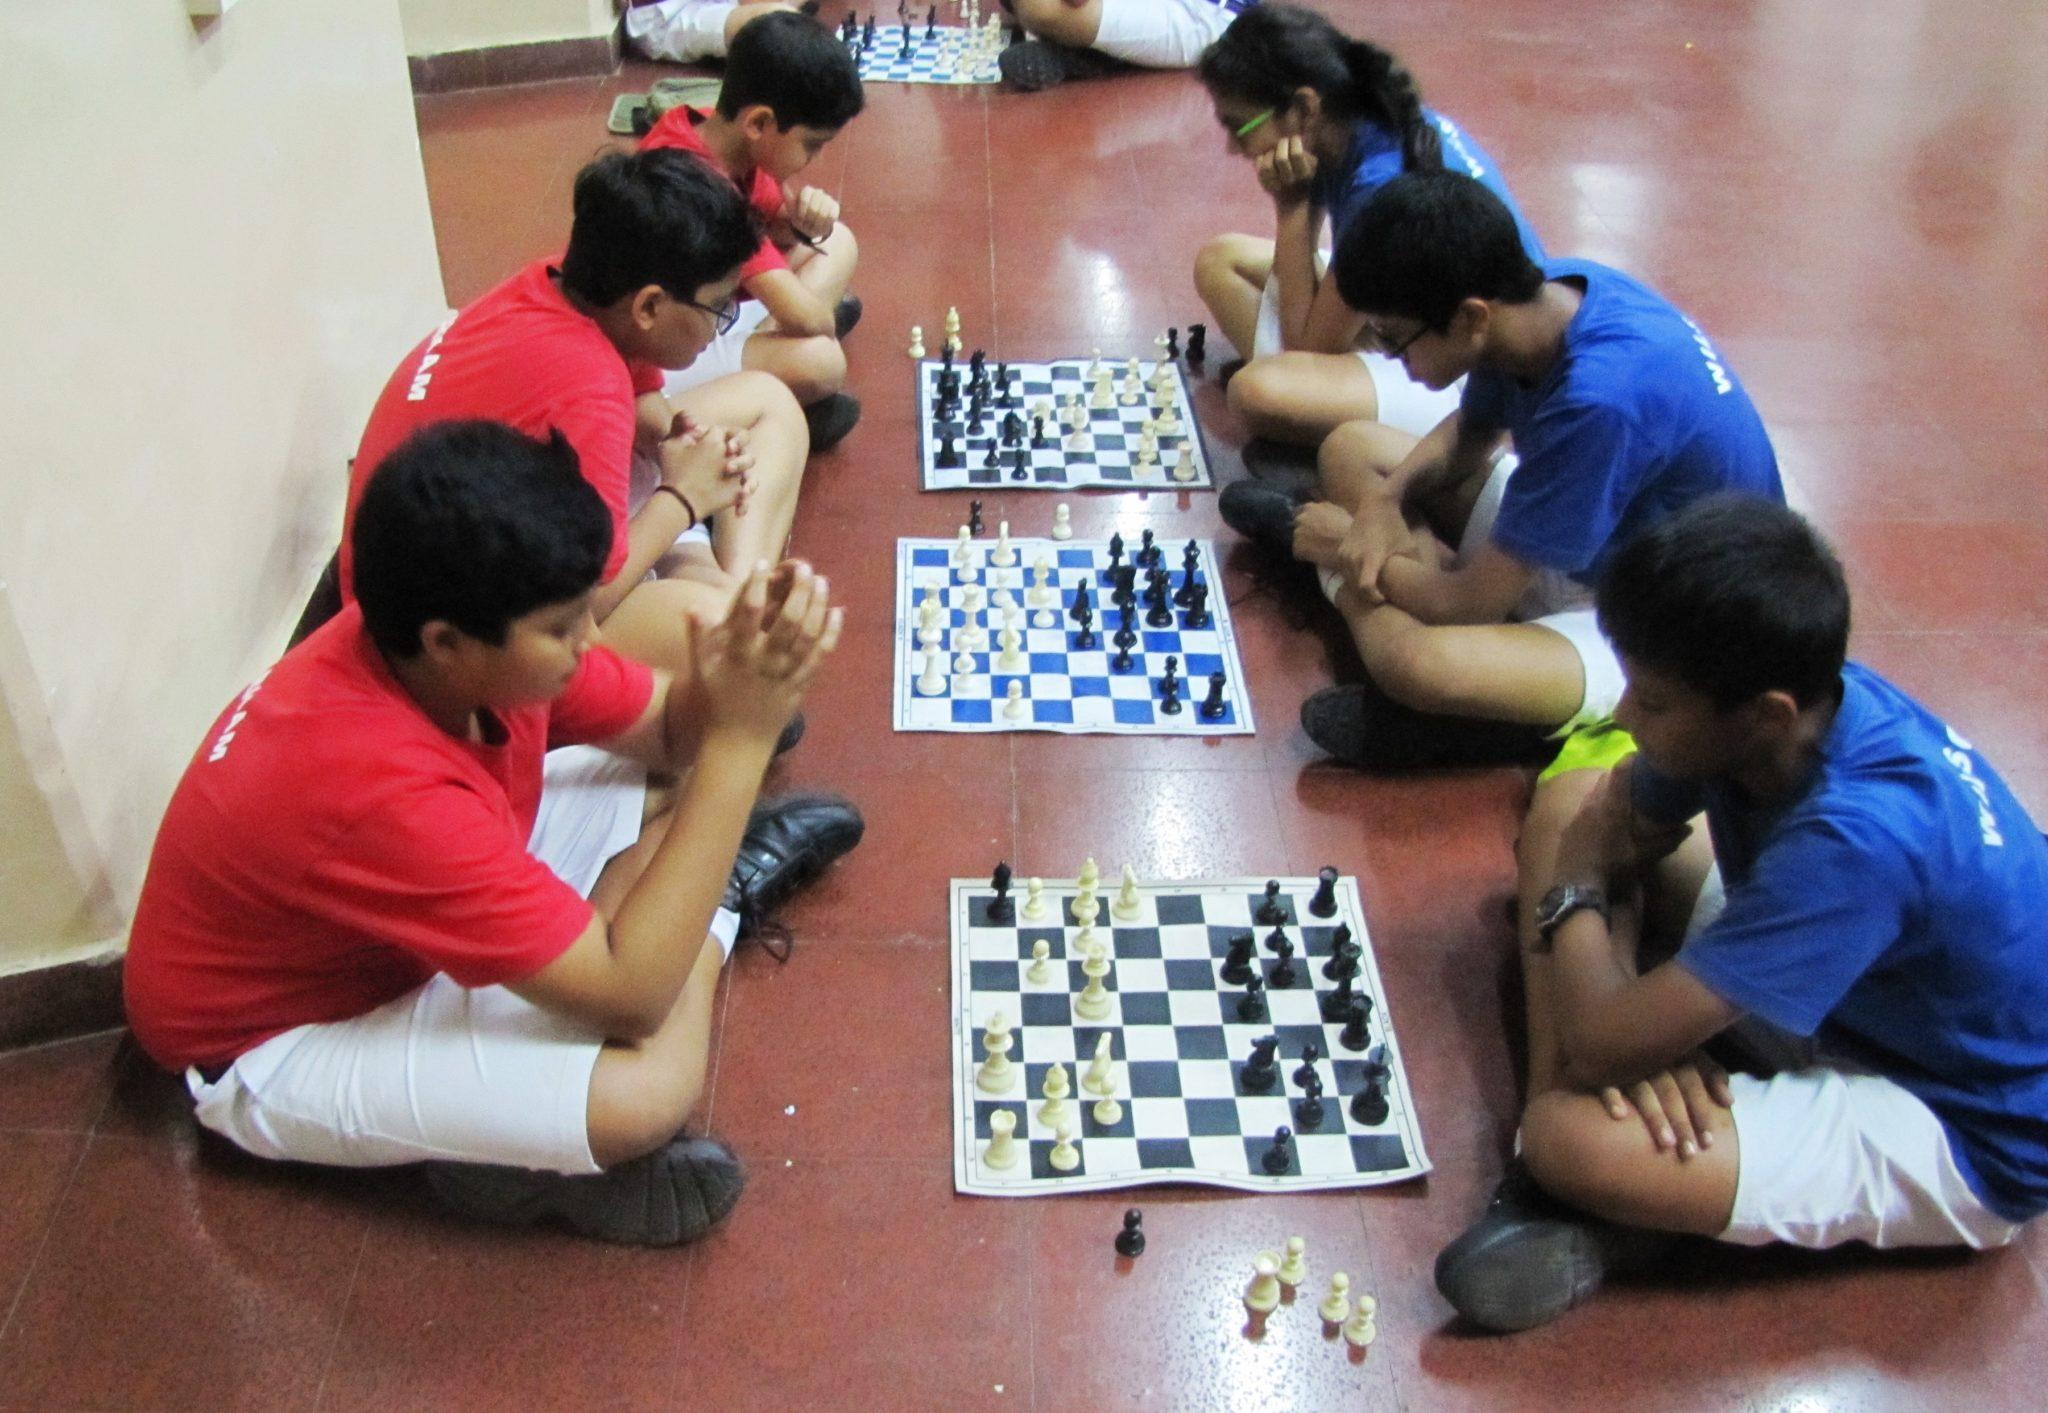 Inter House 9th Std Chess matches Barham and wilson